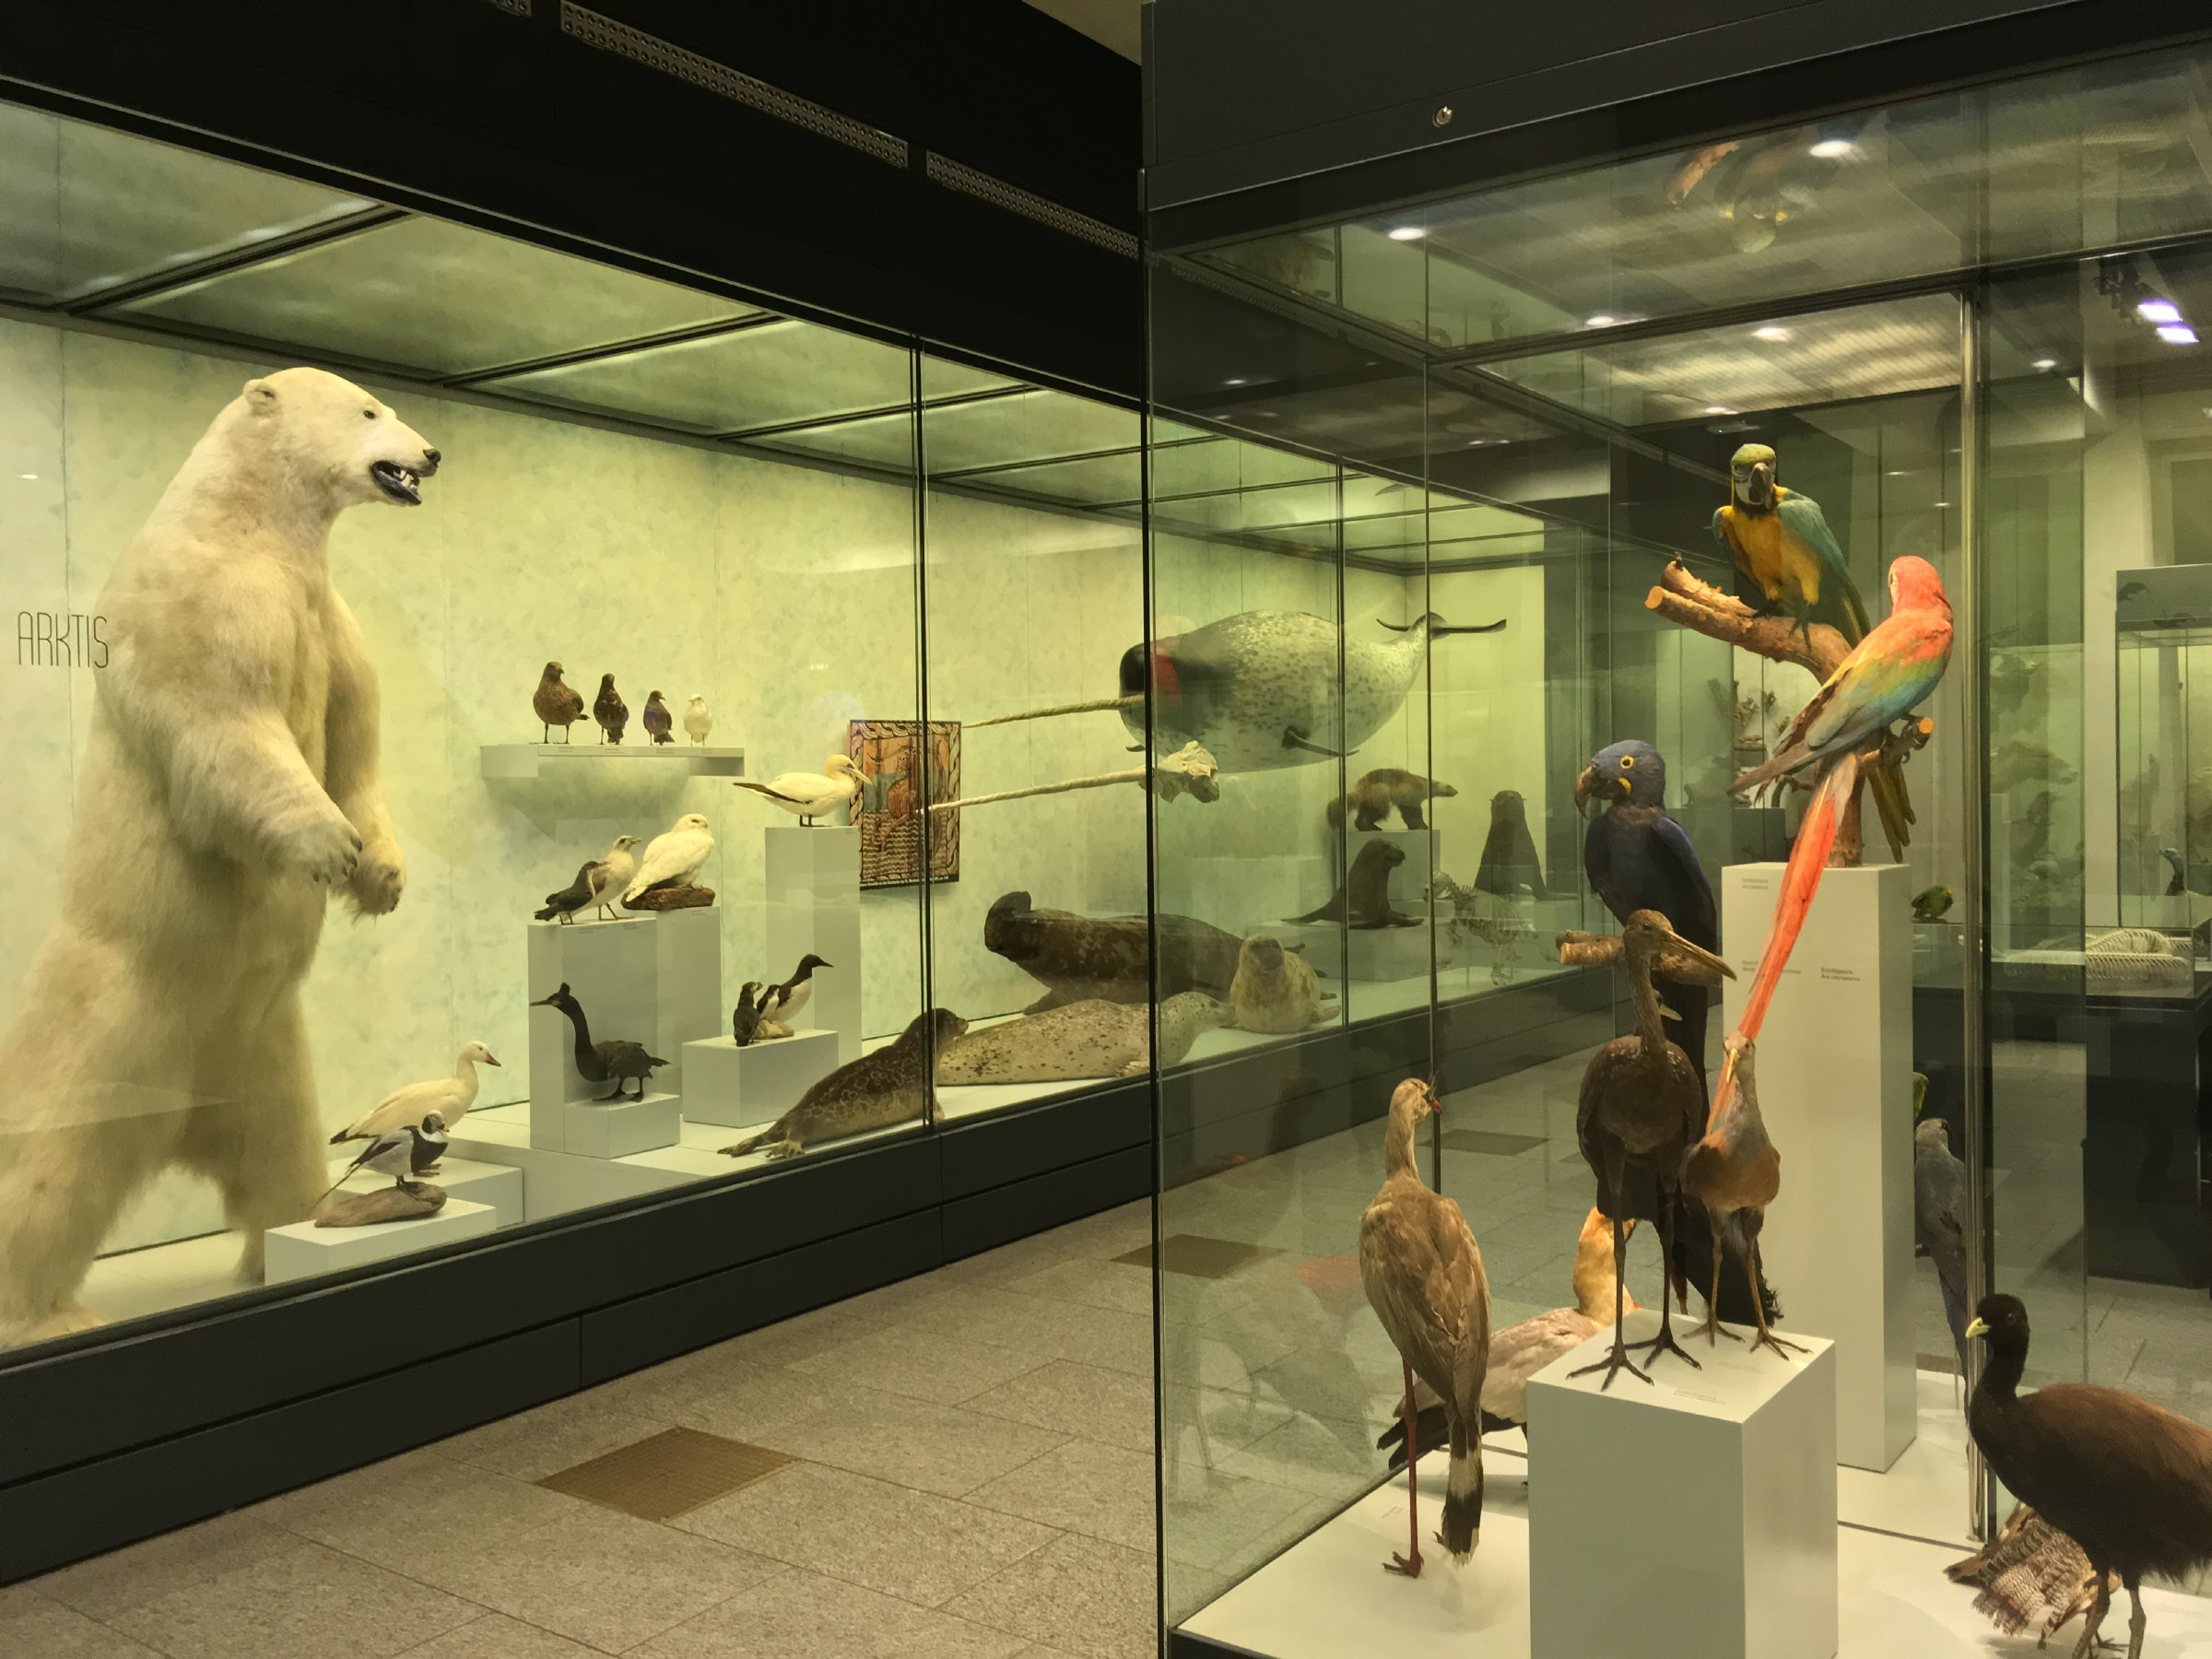 zoological museum kbh sommerland sj